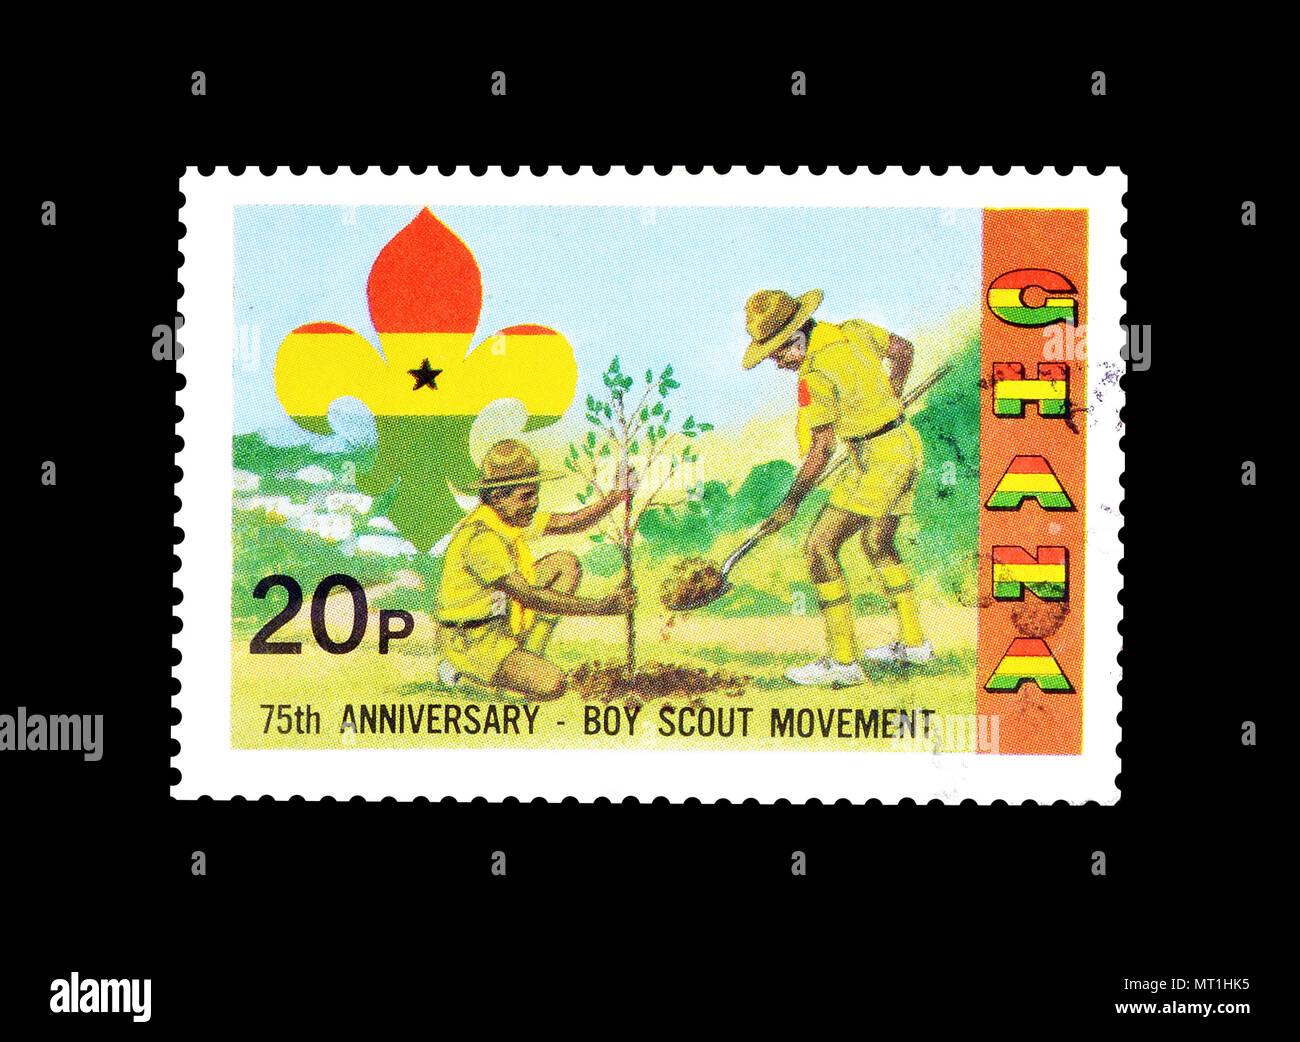 Tree Planting Africa Stock Photos & Tree Planting Africa Stock